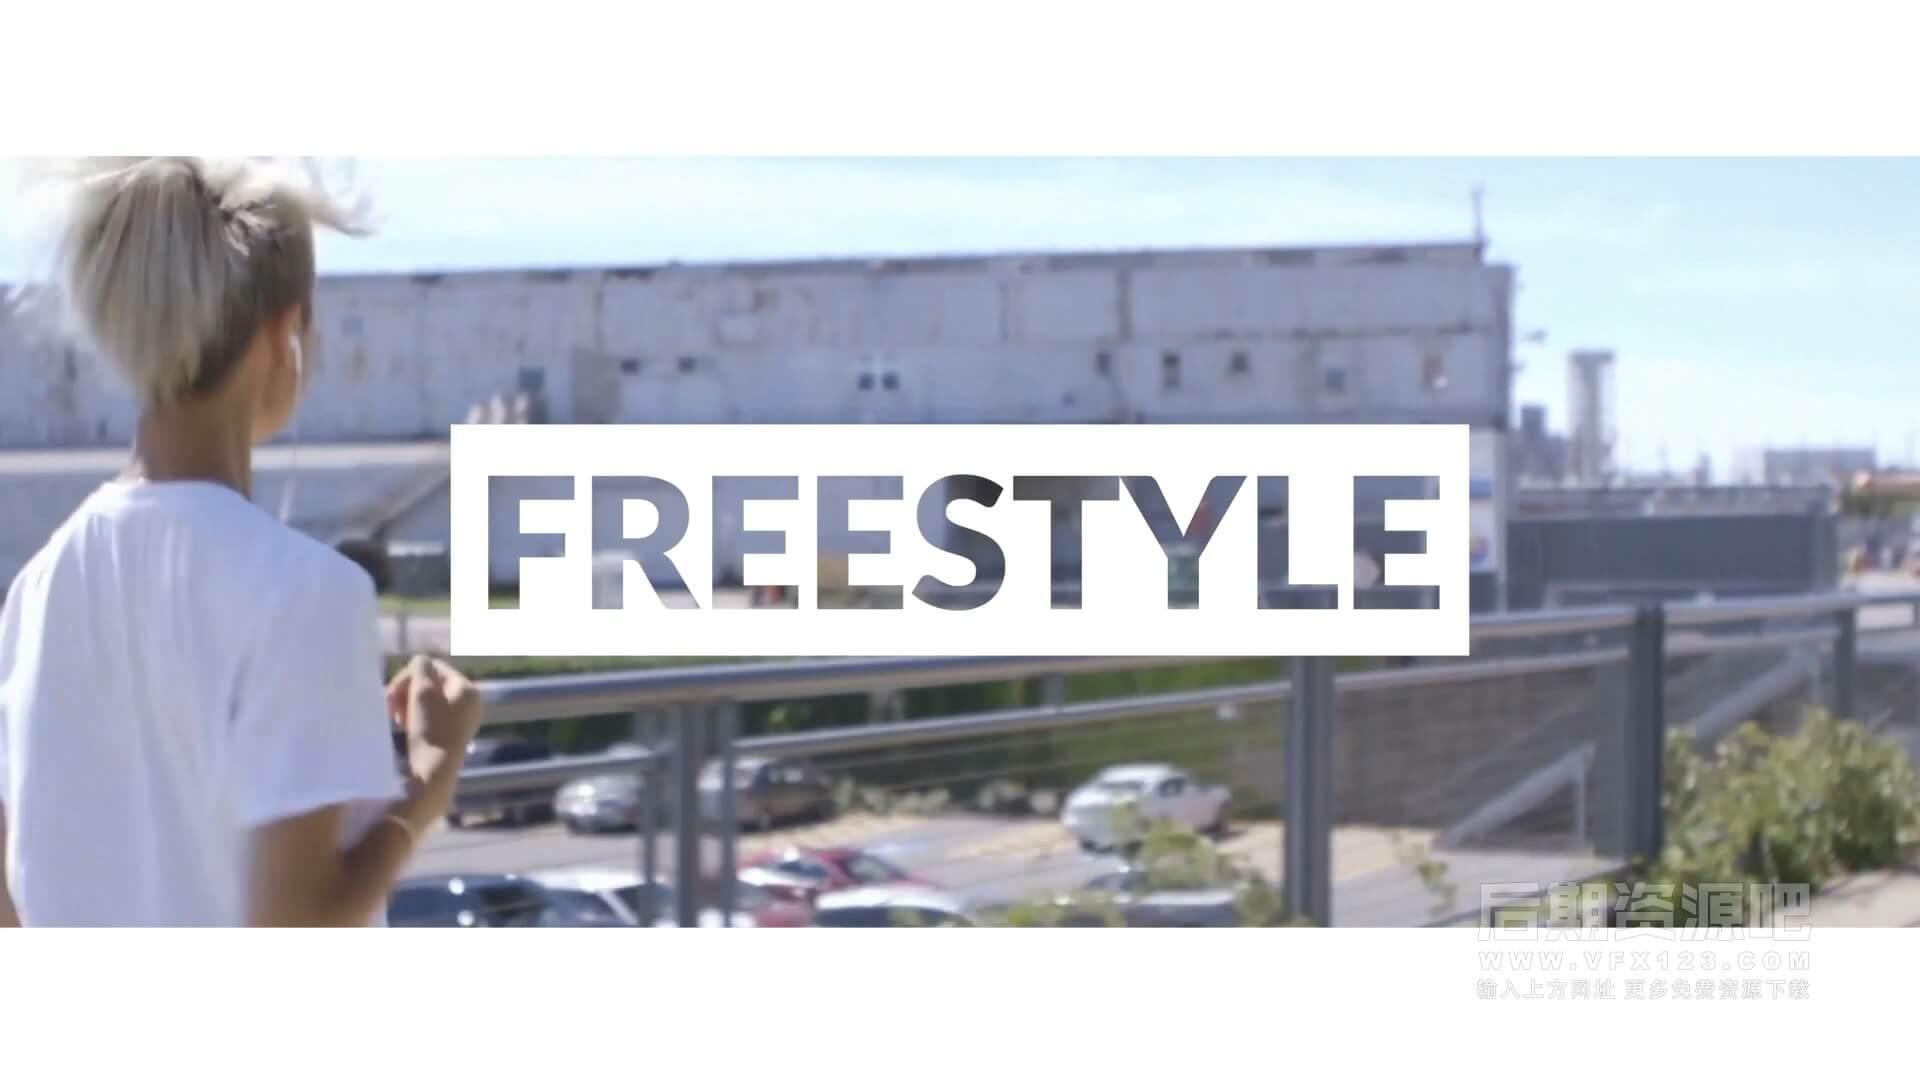 Fcpx主题模板 快节奏照片视频展示模板多滤镜效果 Freestyle Slideshow